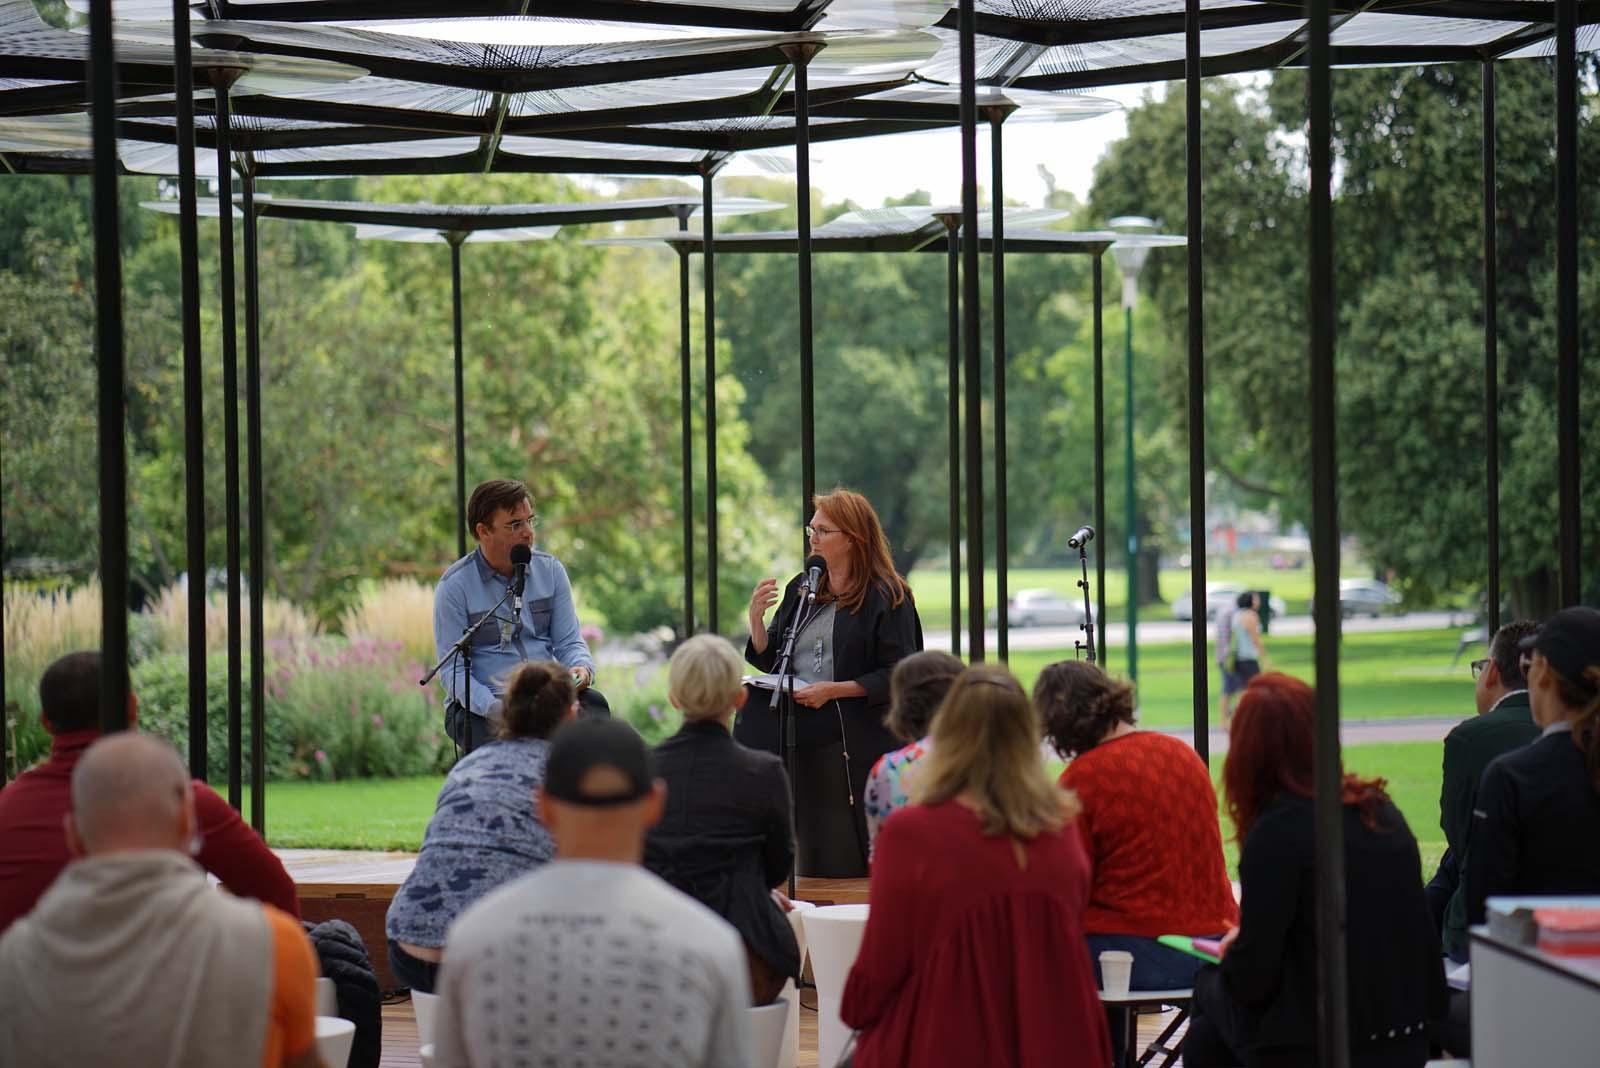 Simon Knott interviews Naomi Milgrom AO, MRelay Part 1: Habitat, January 2016